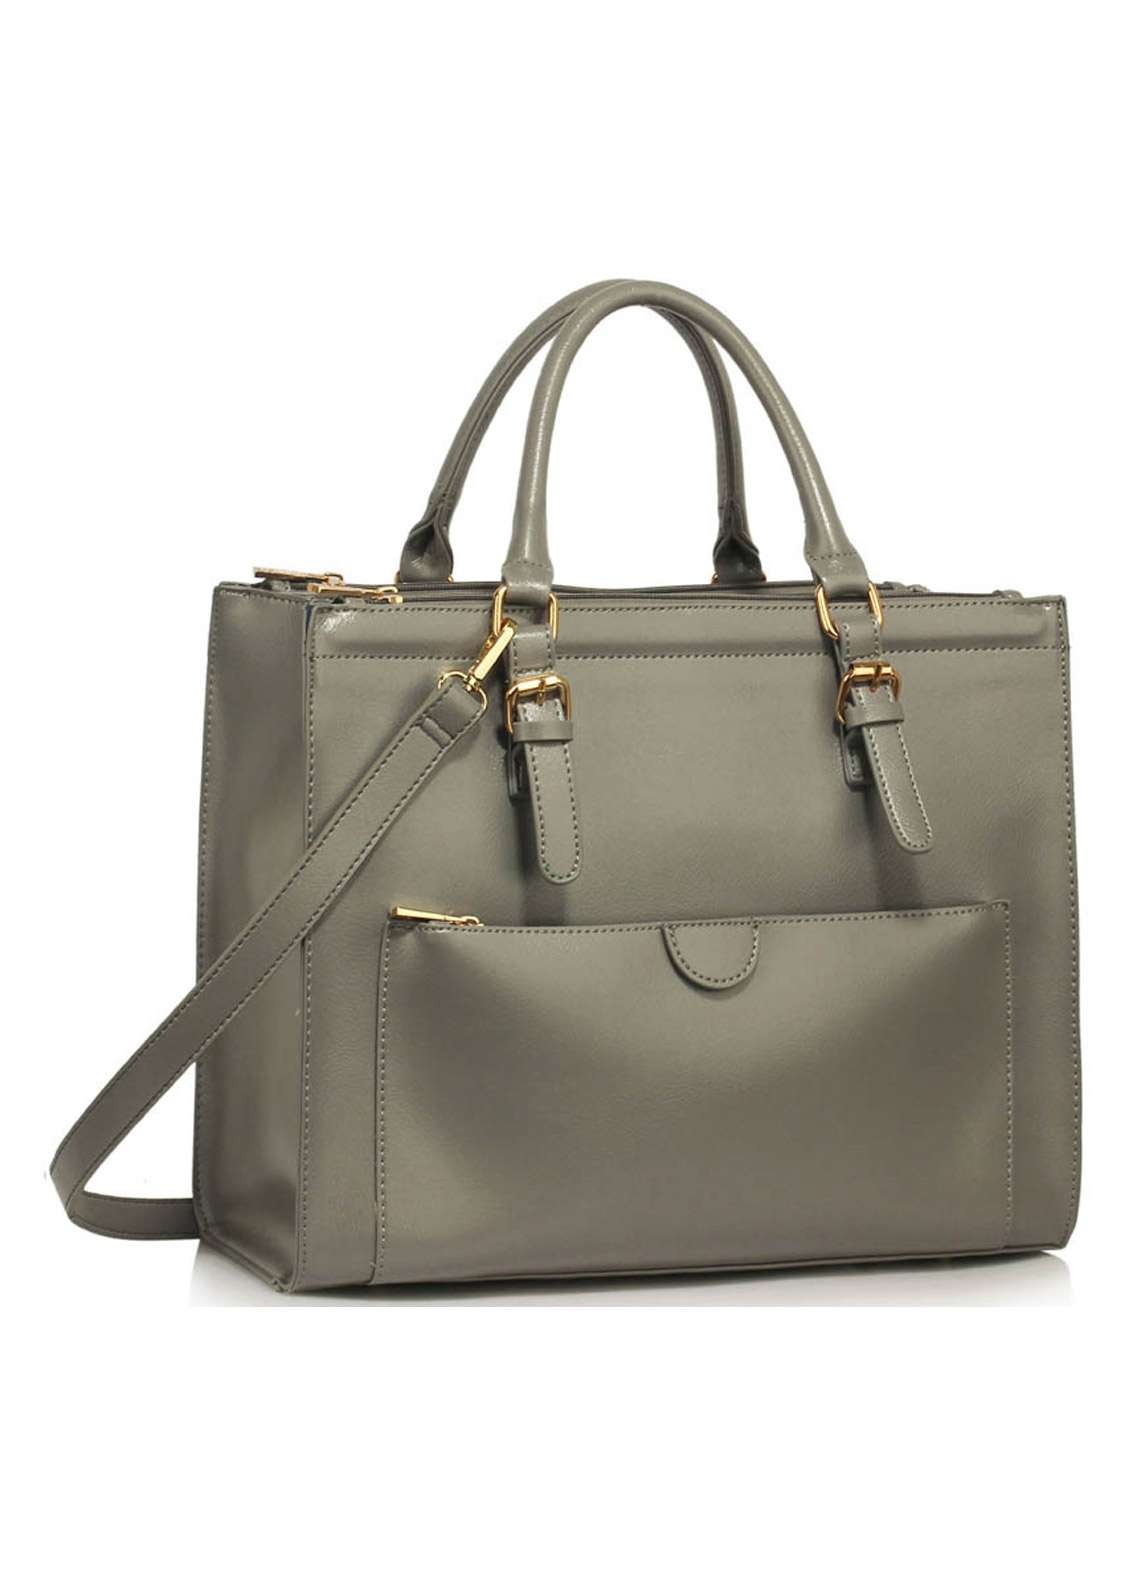 Leesun London Faux Leather Tote  Bags for Women Grey